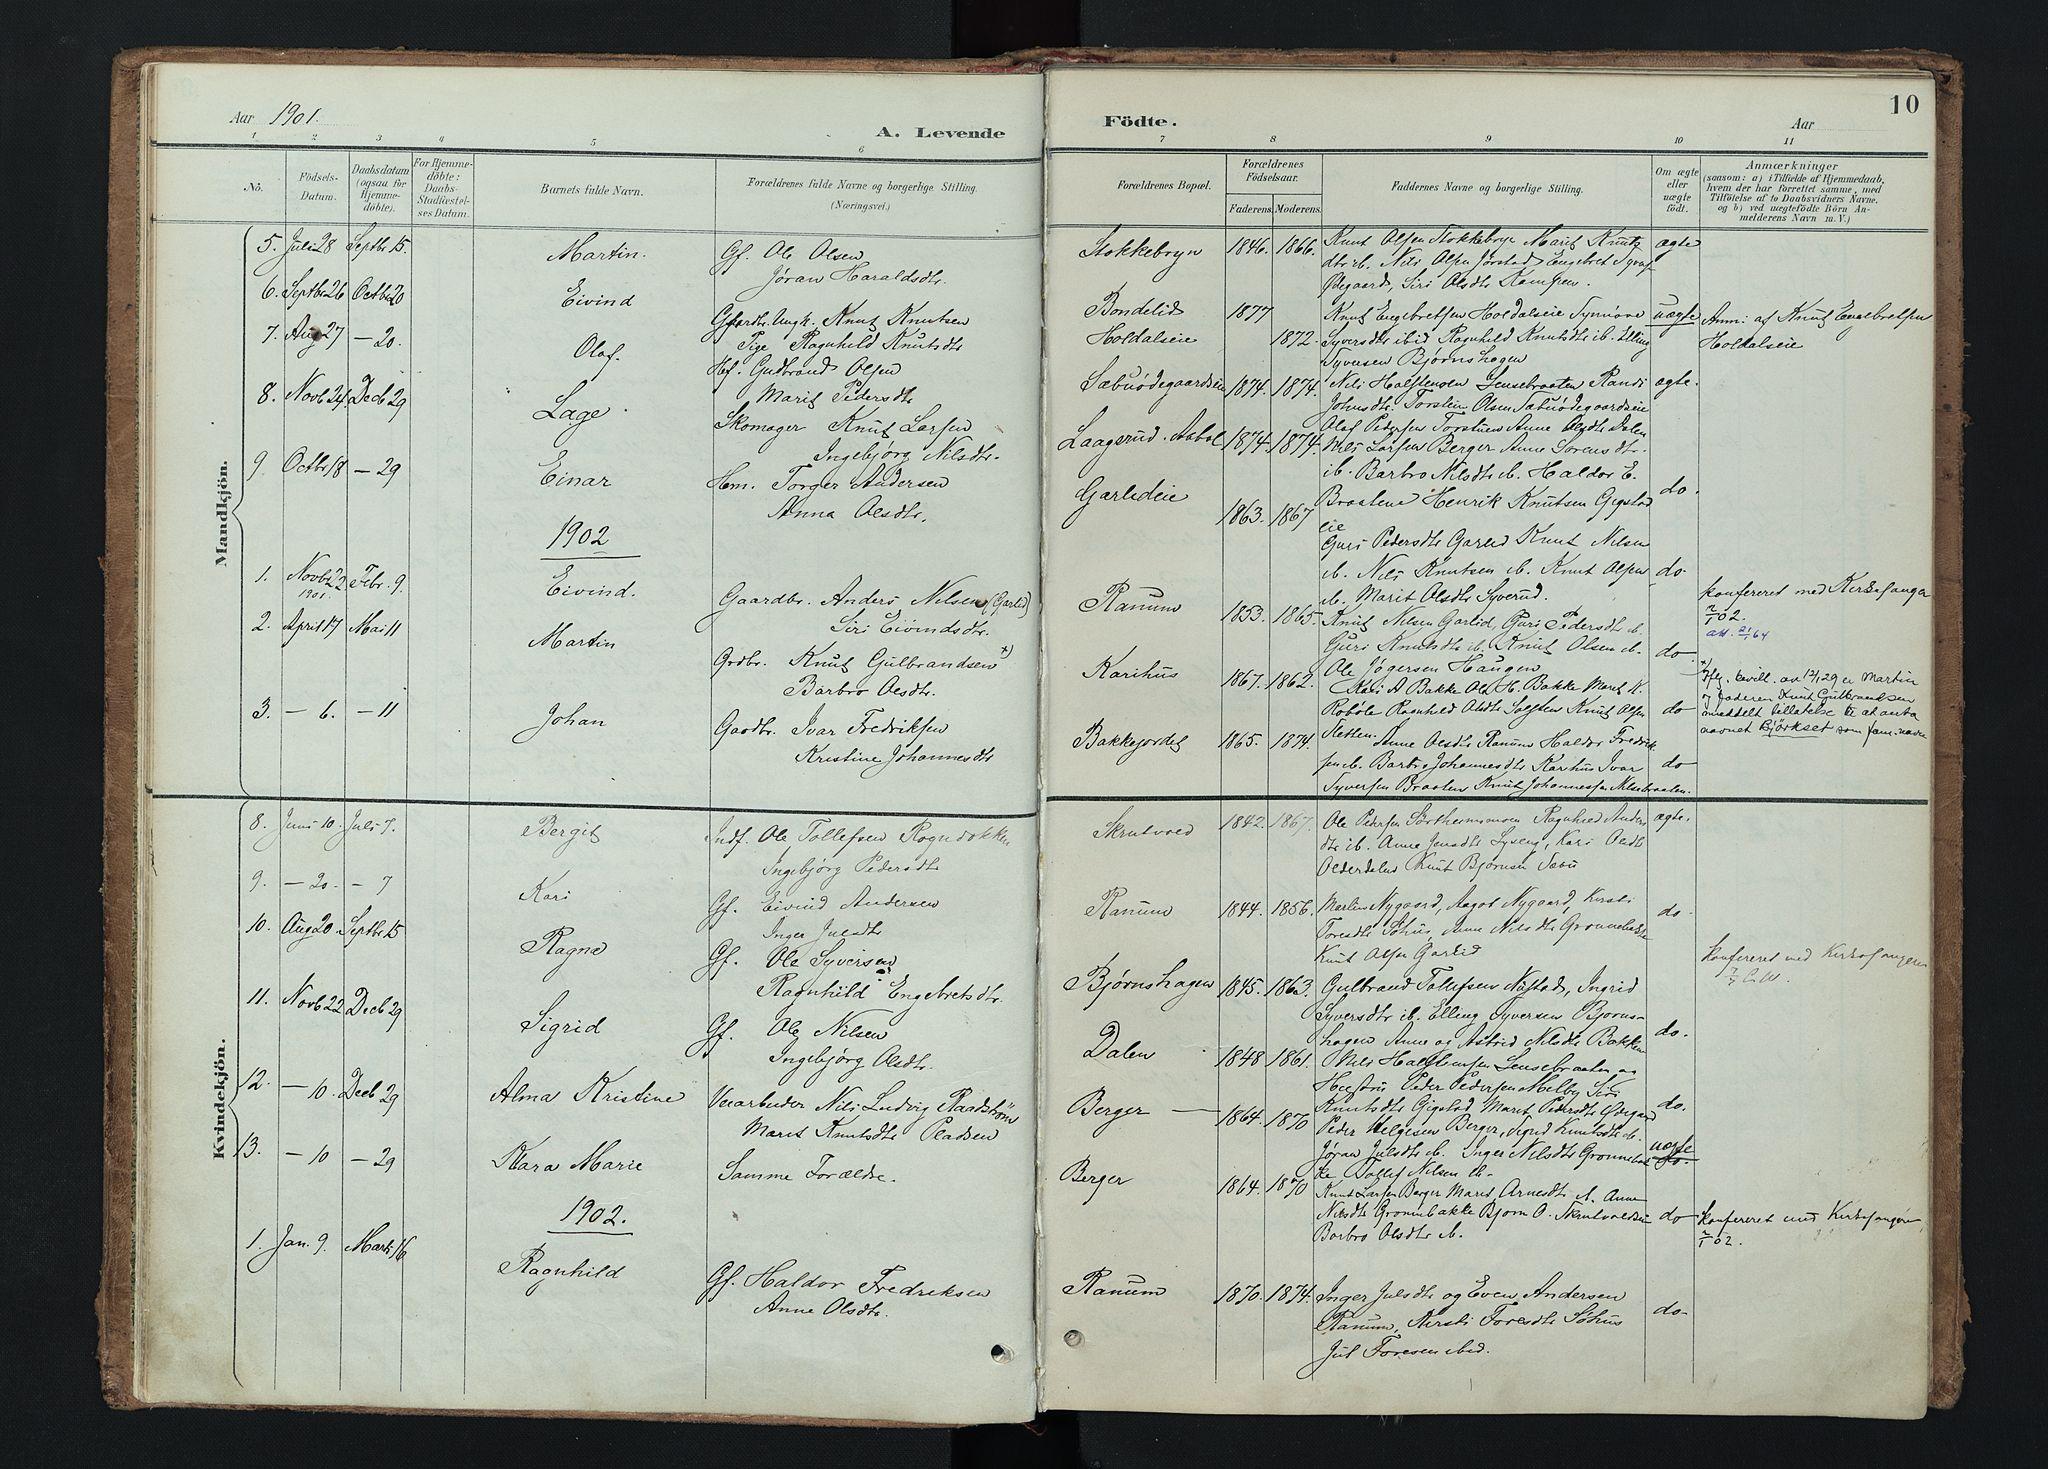 SAH, Nord-Aurdal prestekontor, Ministerialbok nr. 15, 1896-1914, s. 10